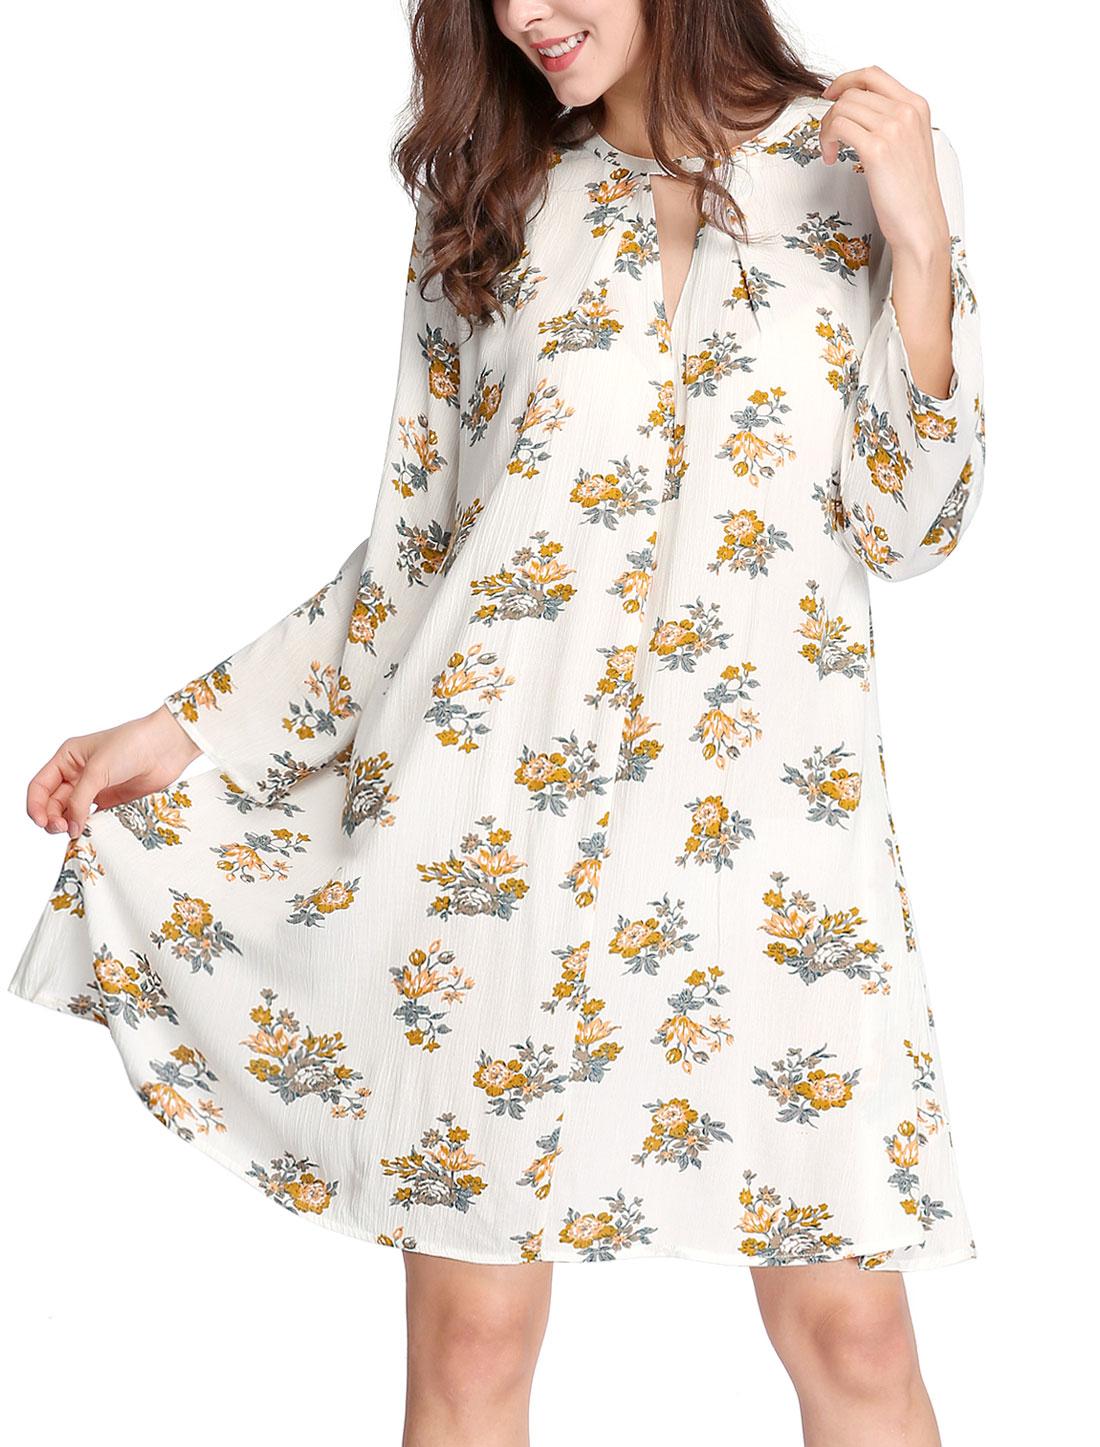 Women Keyhole Front Floral Prints Oversized Swing Dress White L